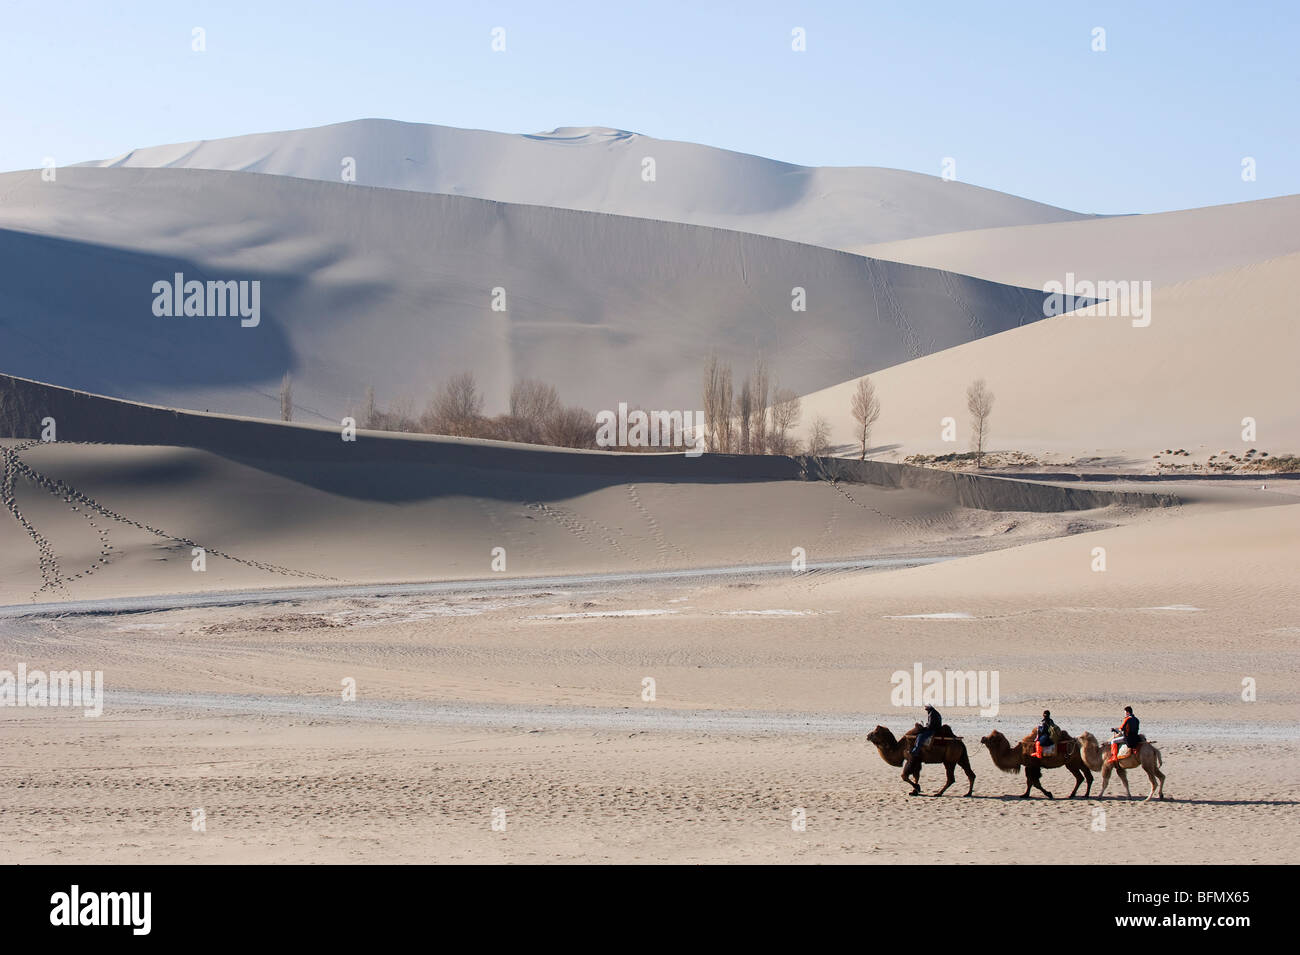 China, Gansu Province, Dunghuang, camels in Ming Sha sand dunes - Stock Image